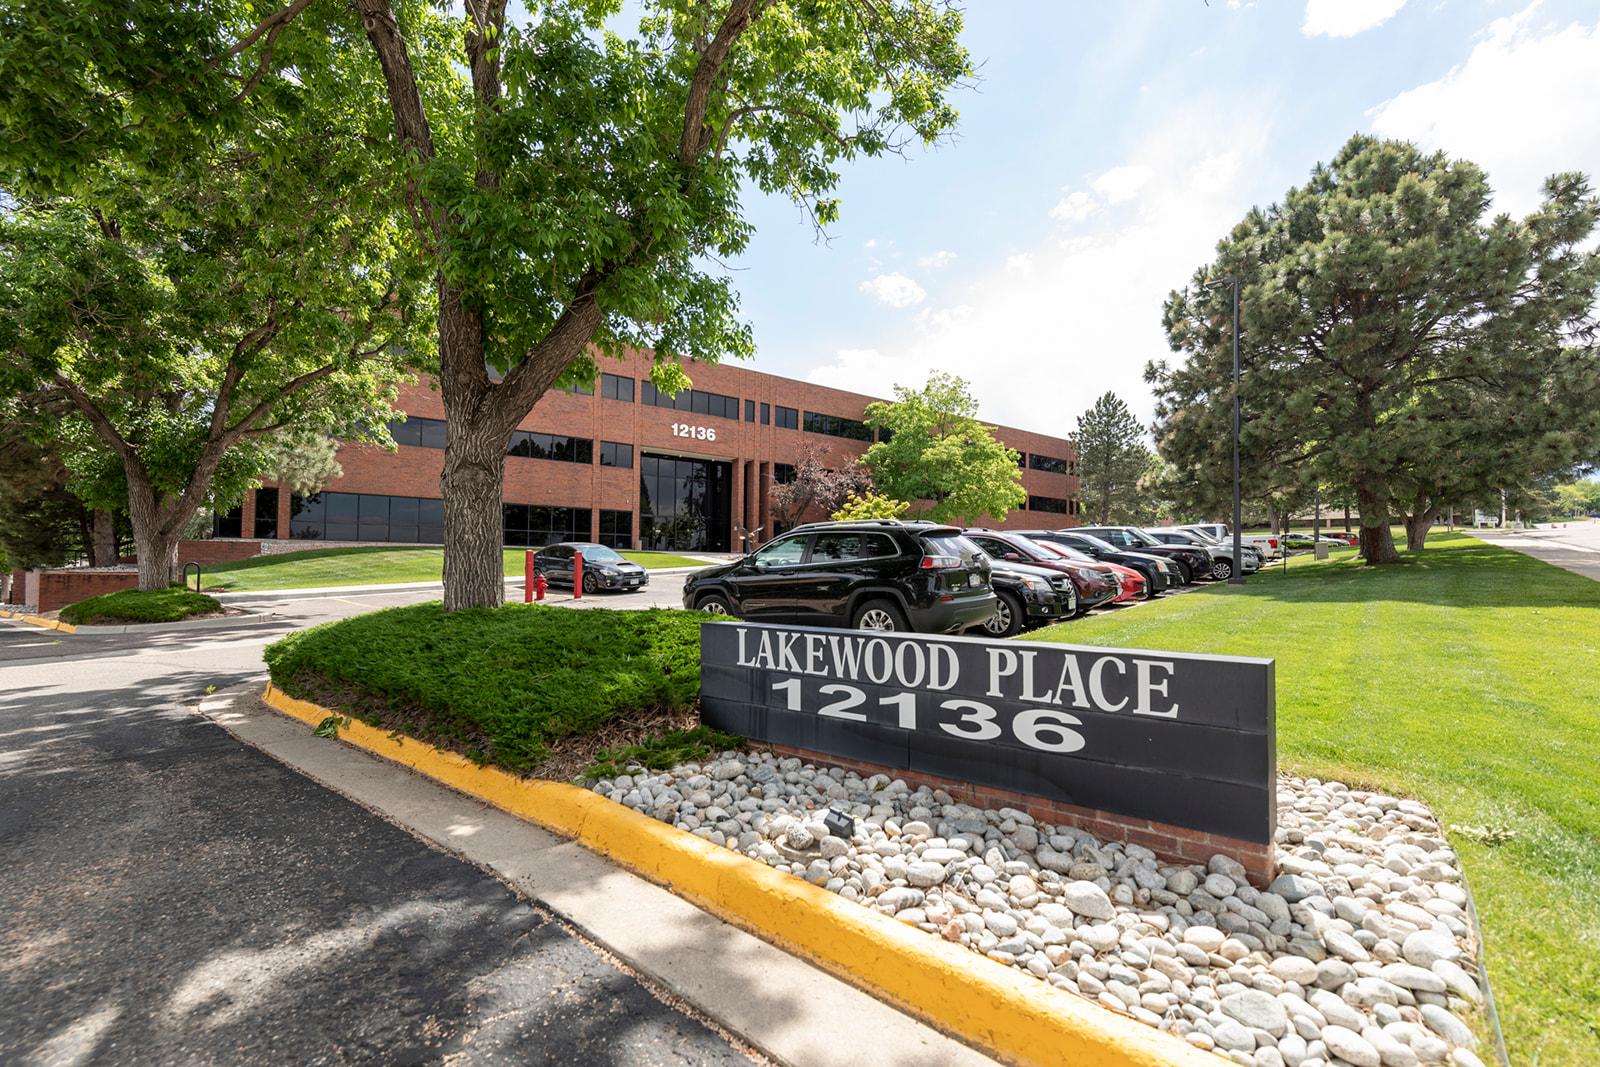 5-Lakewood-Place-2021-web-30.jpg